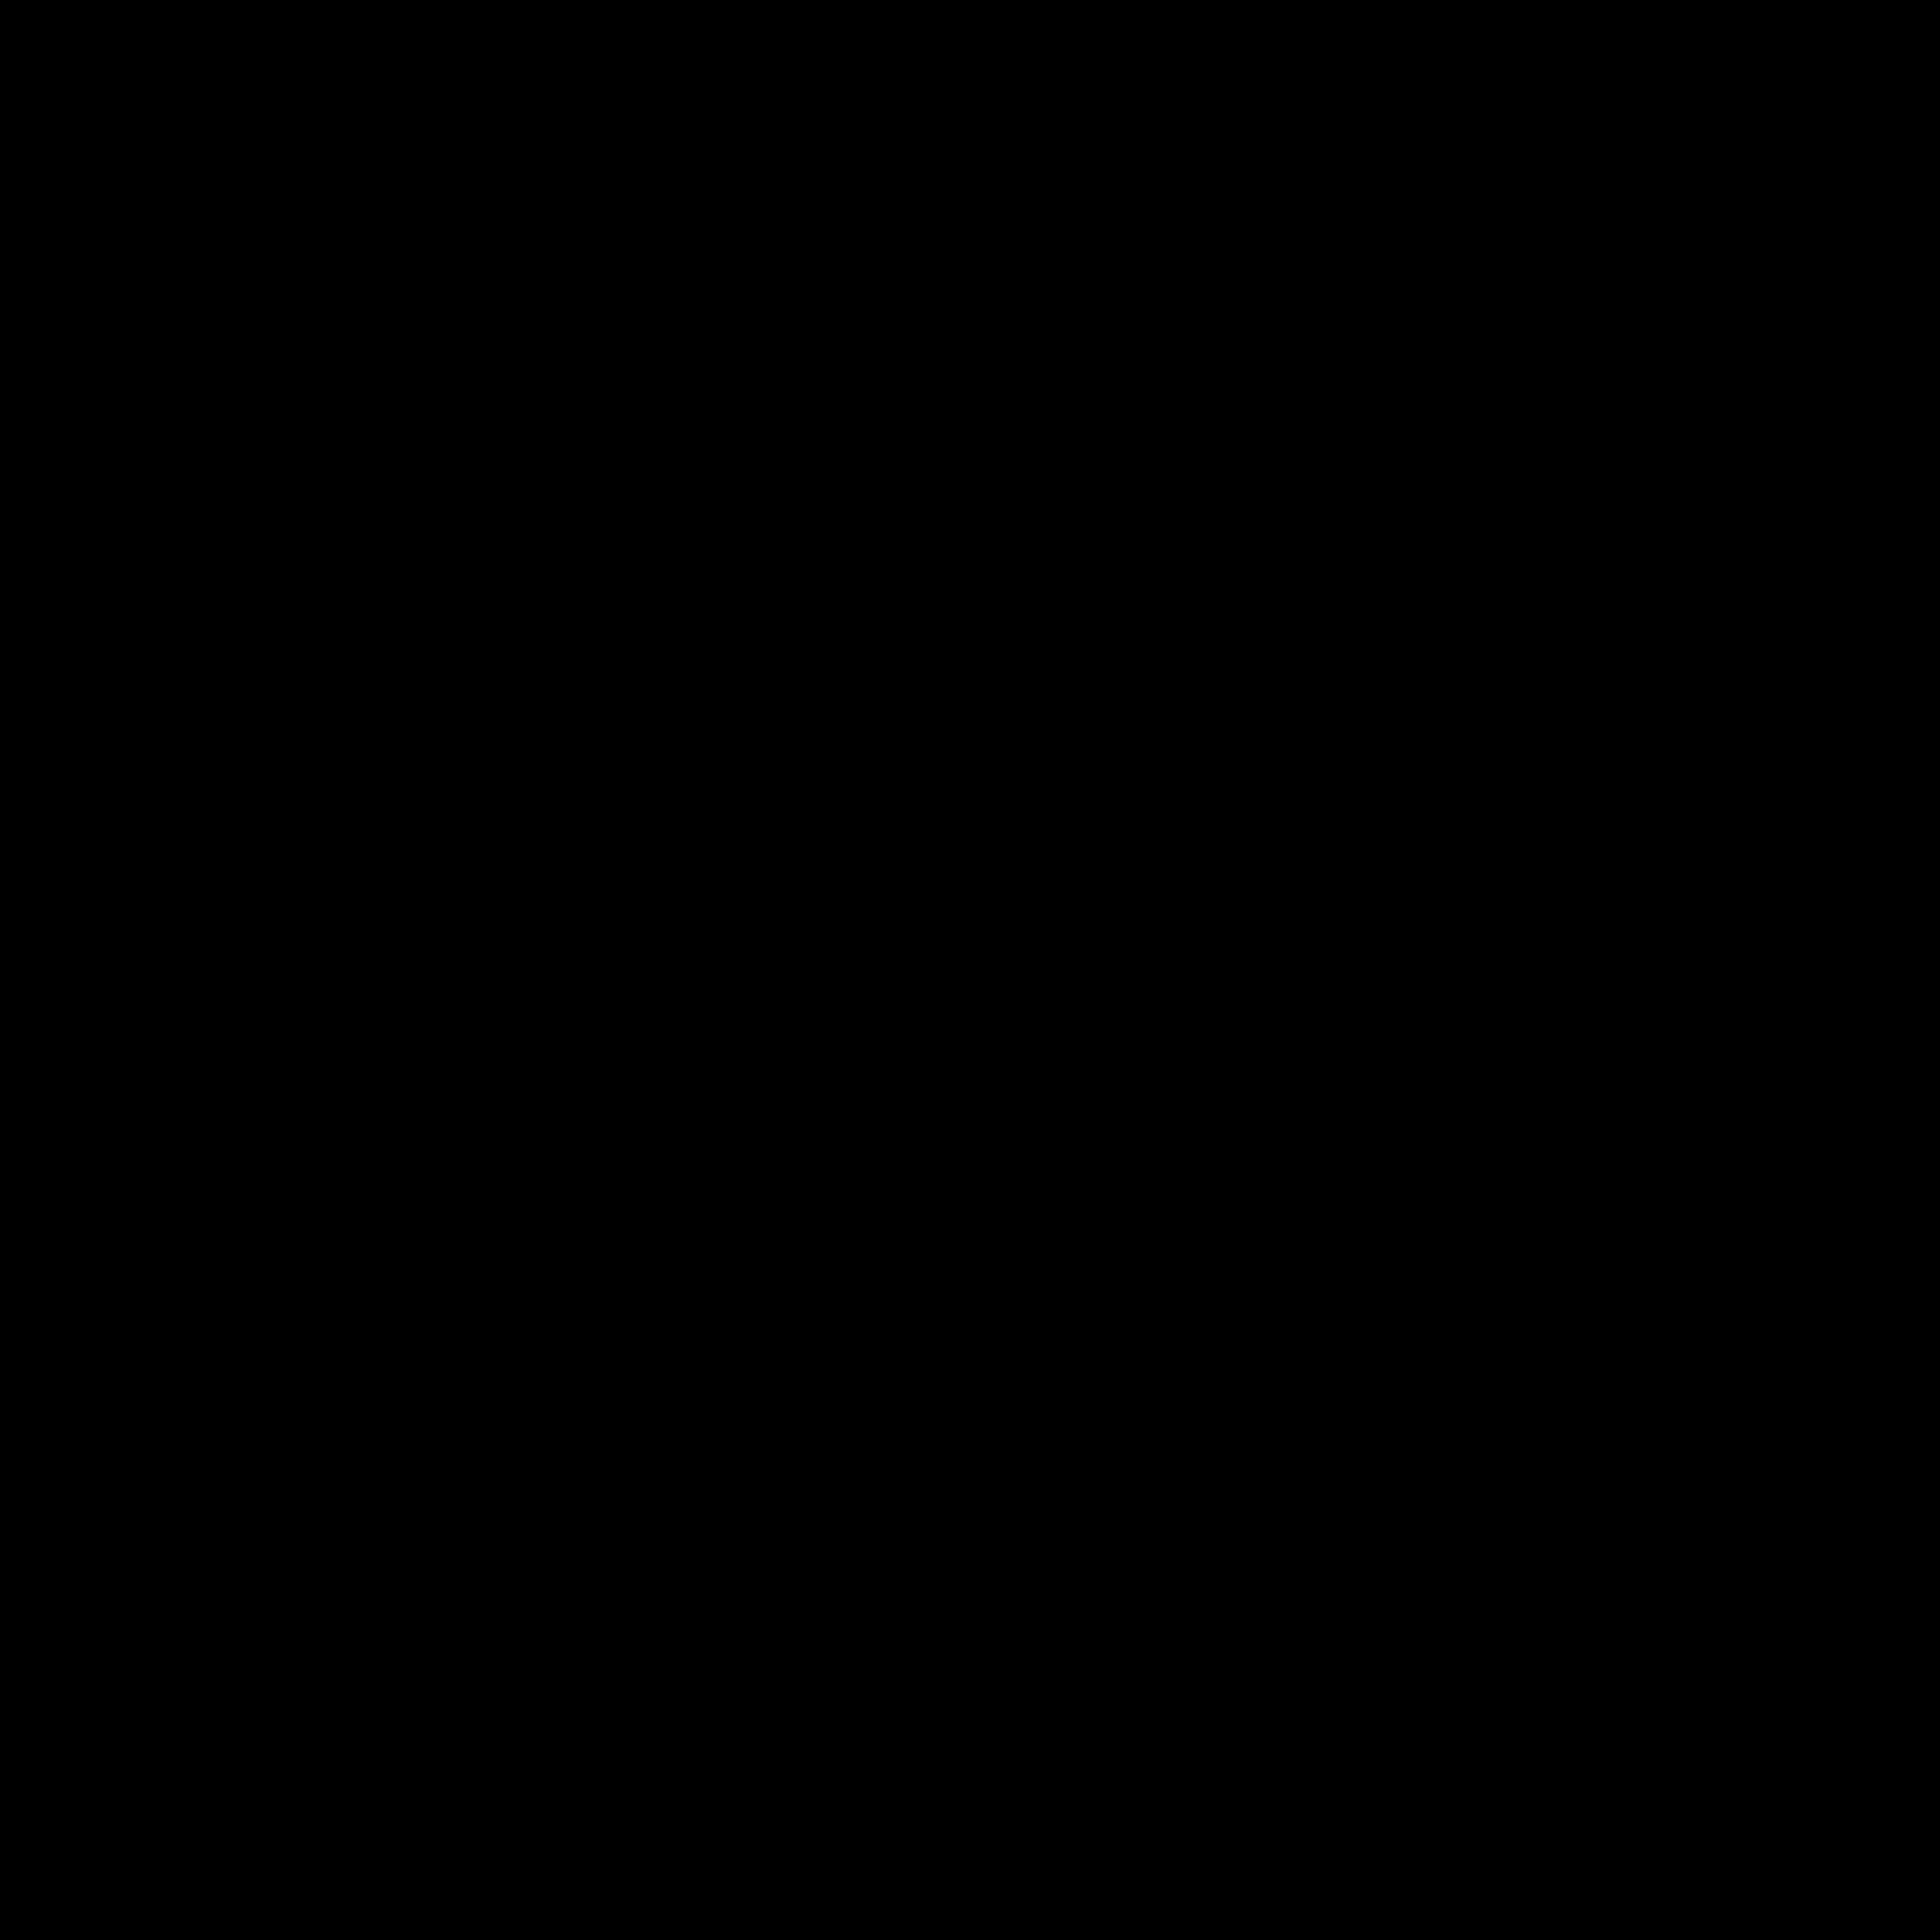 Magazin AK47 60Schuss Polymer